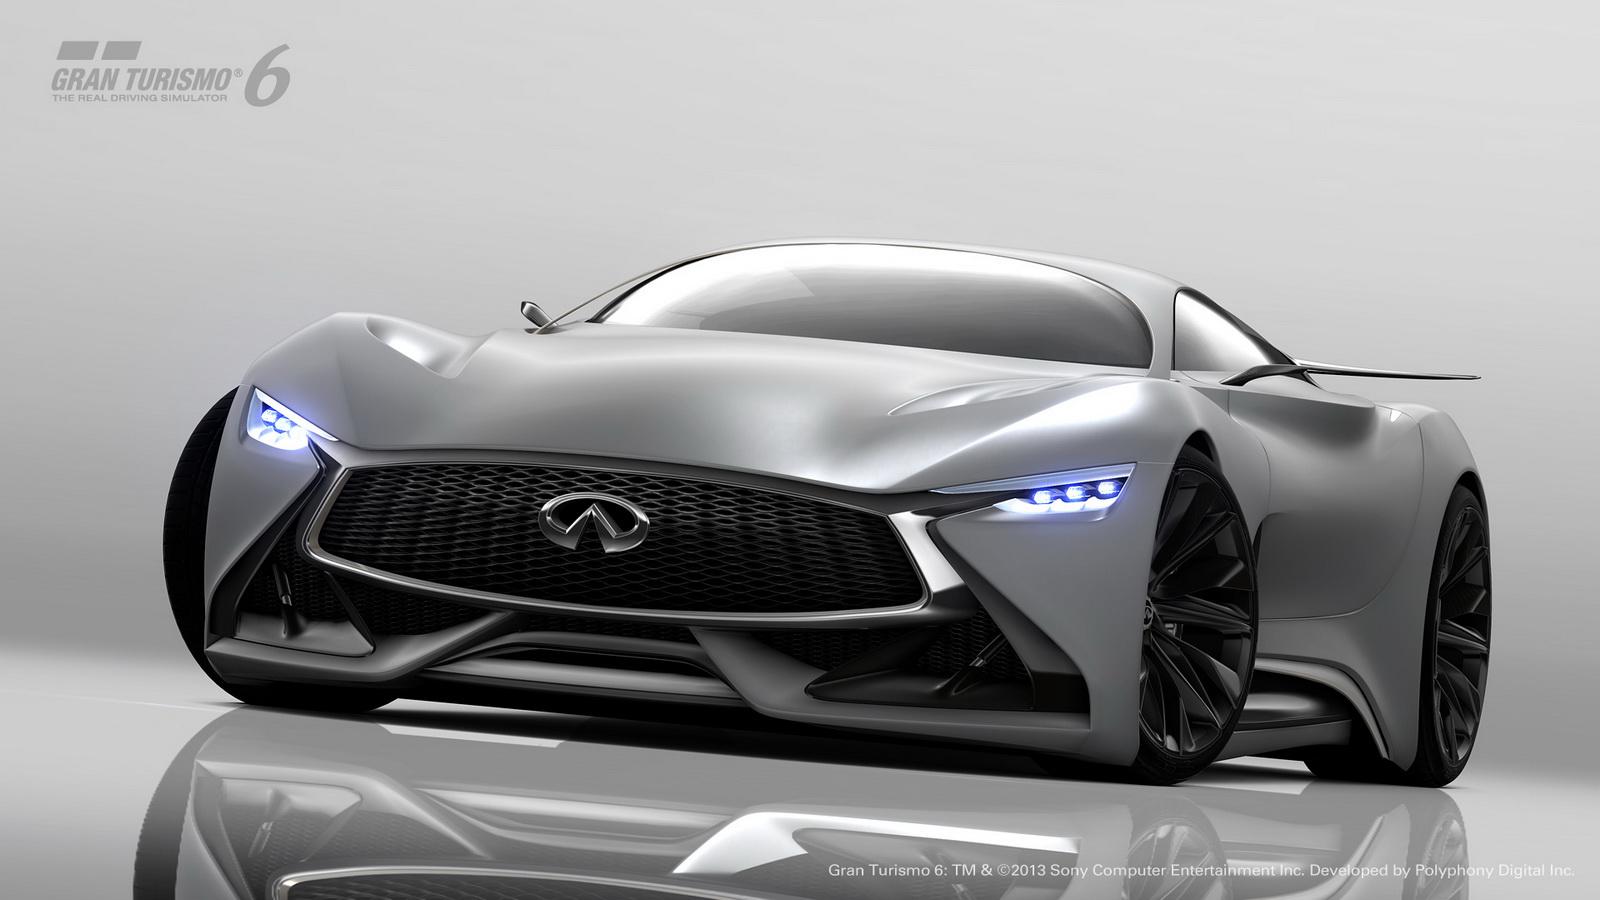 Infiniti infiniti concept car : Official: Infiniti Vision Gran Turismo Concept - GTspirit